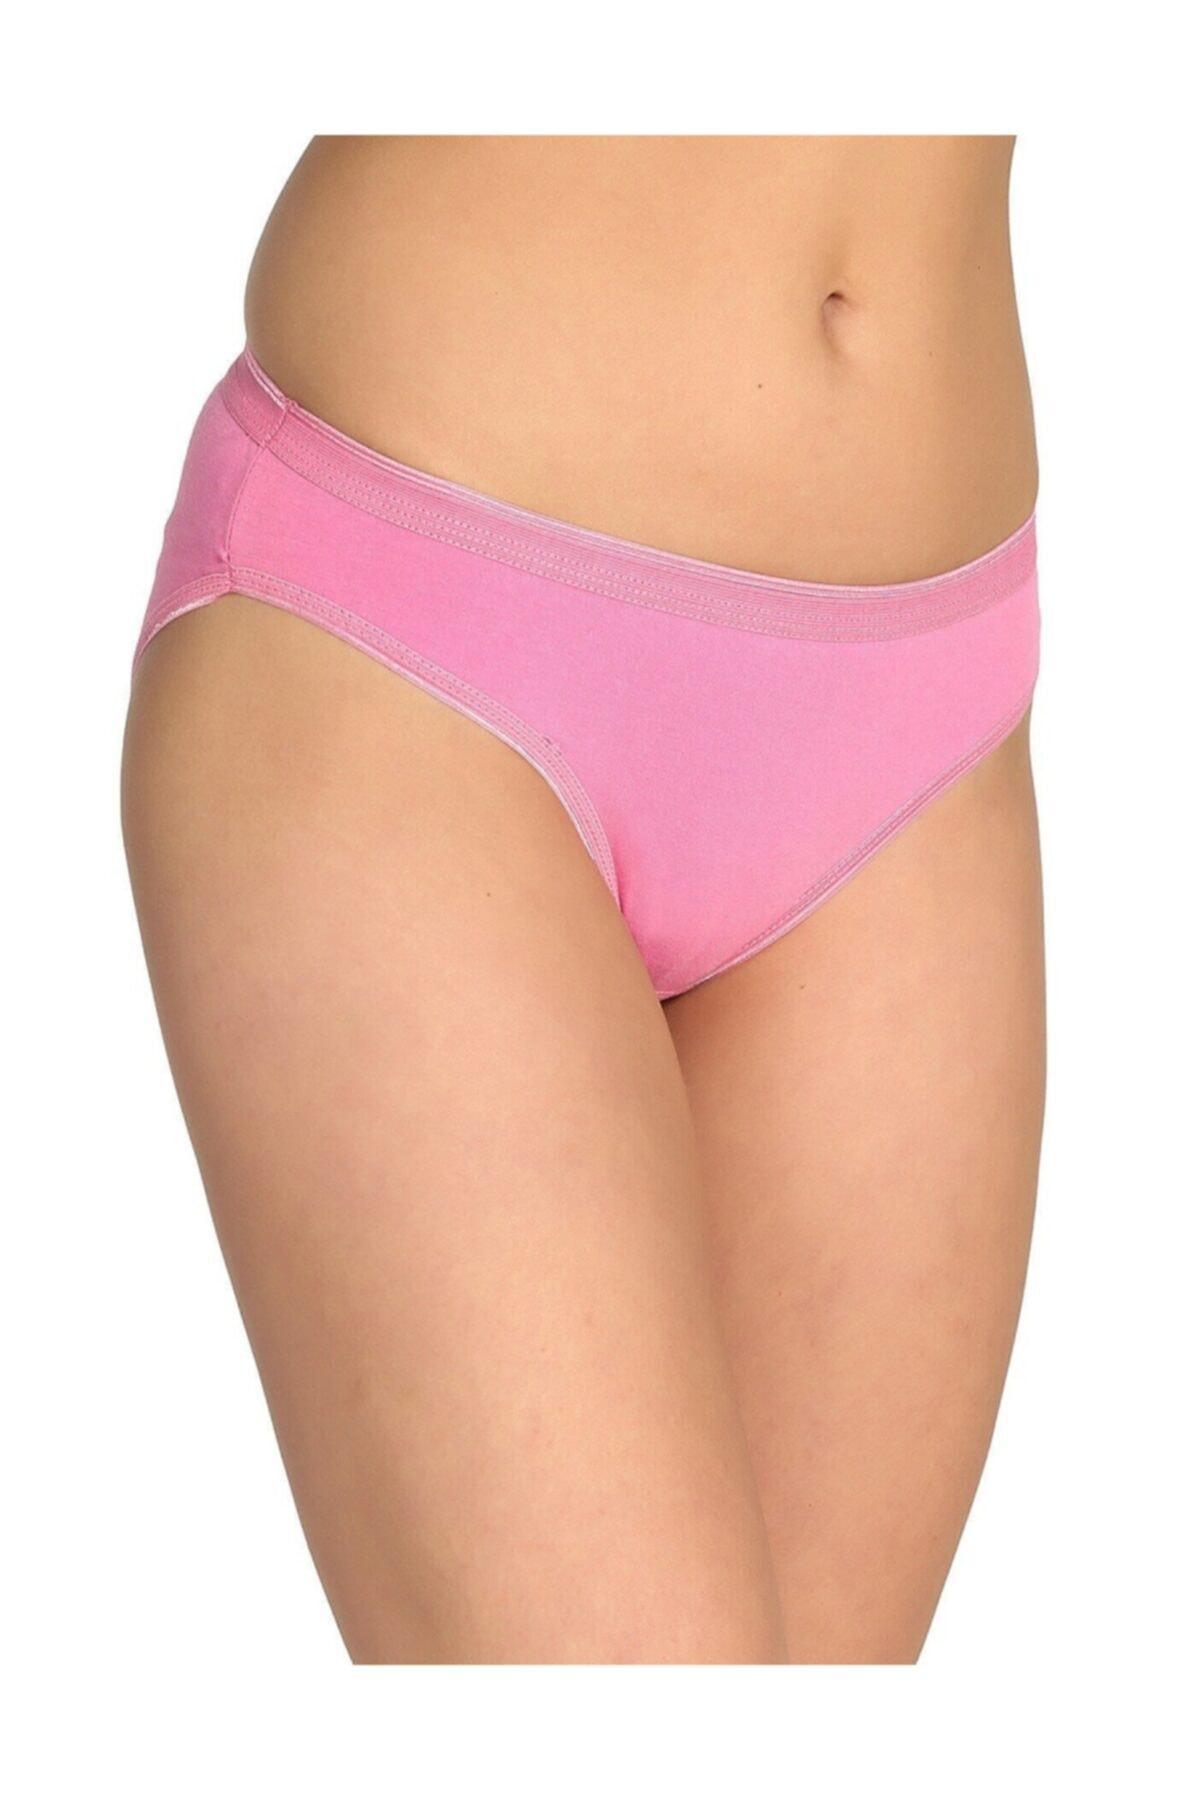 Tutku Kadın 6'lı Paket Bikini Slip Külot (Pembe) 1